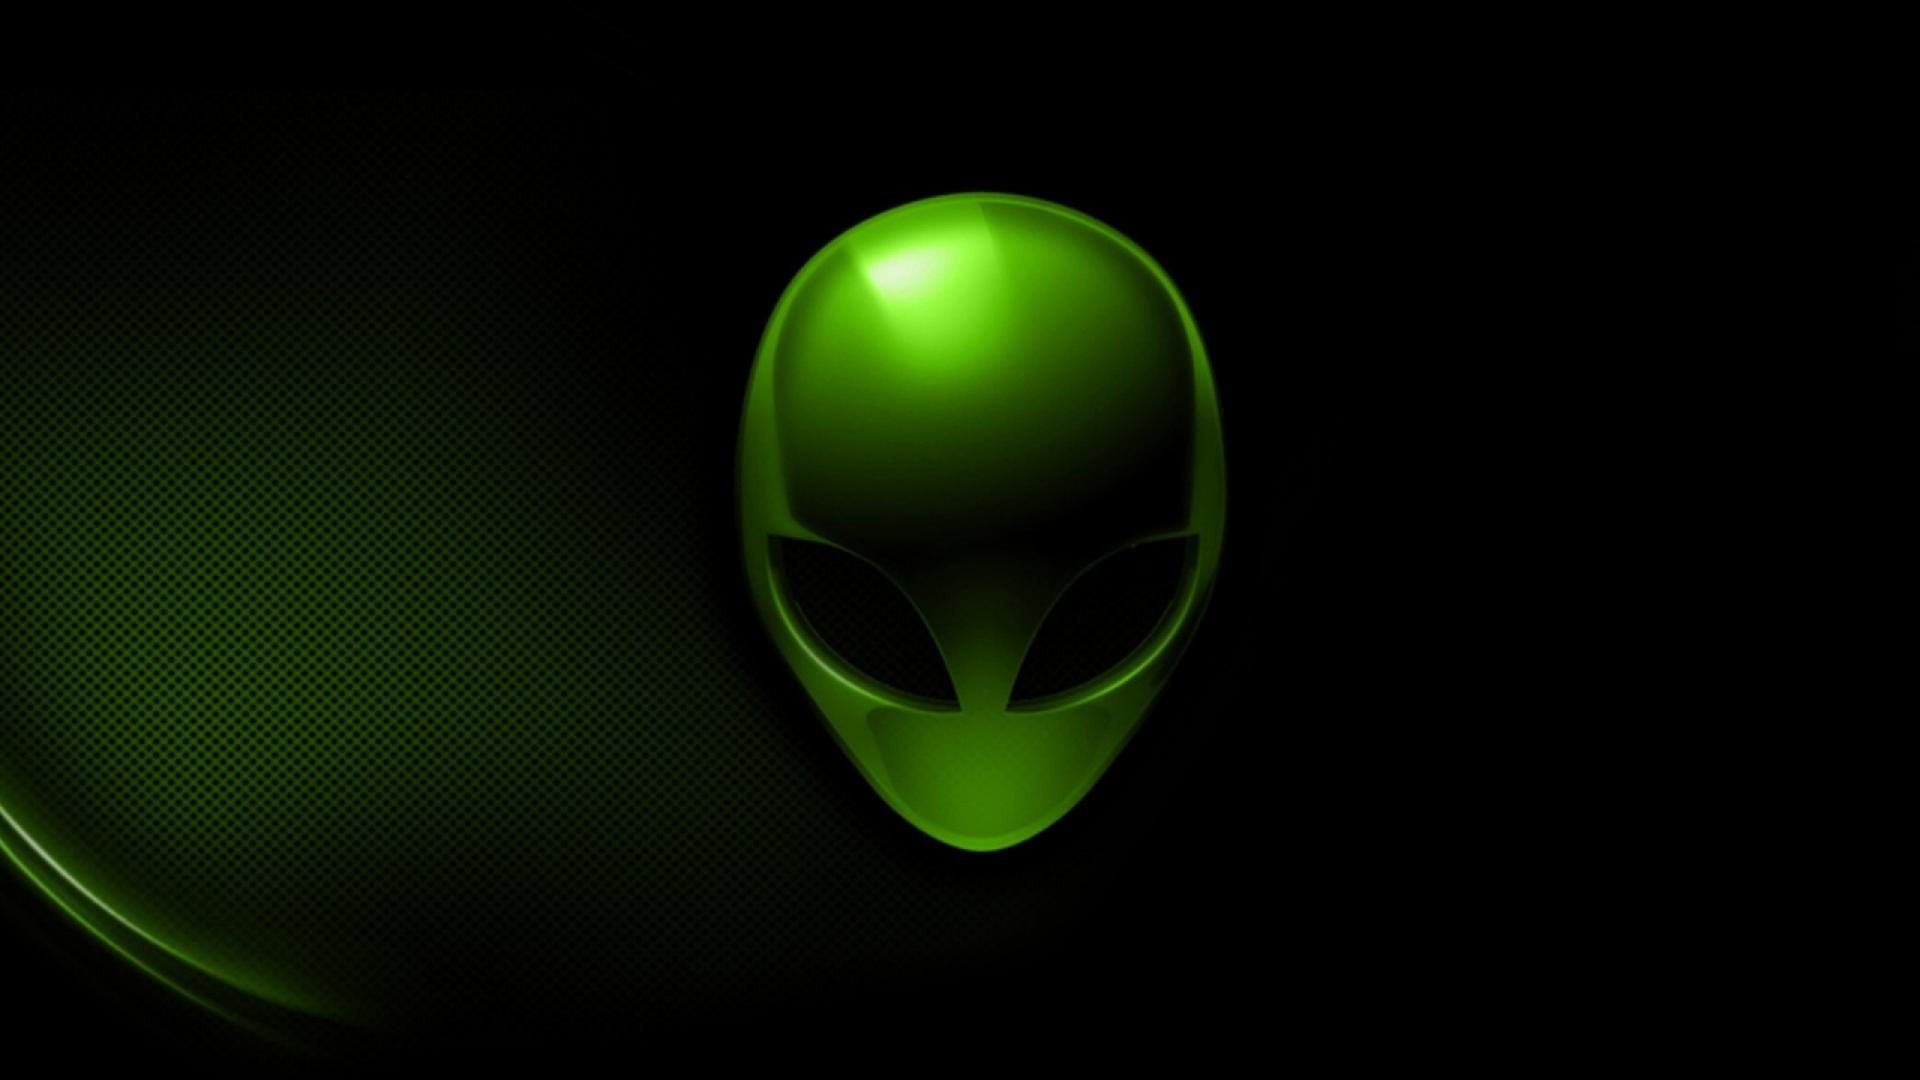 3d green alien head wallpaper 1920x1080 Wallpapers HD Wallpapers 1920x1080